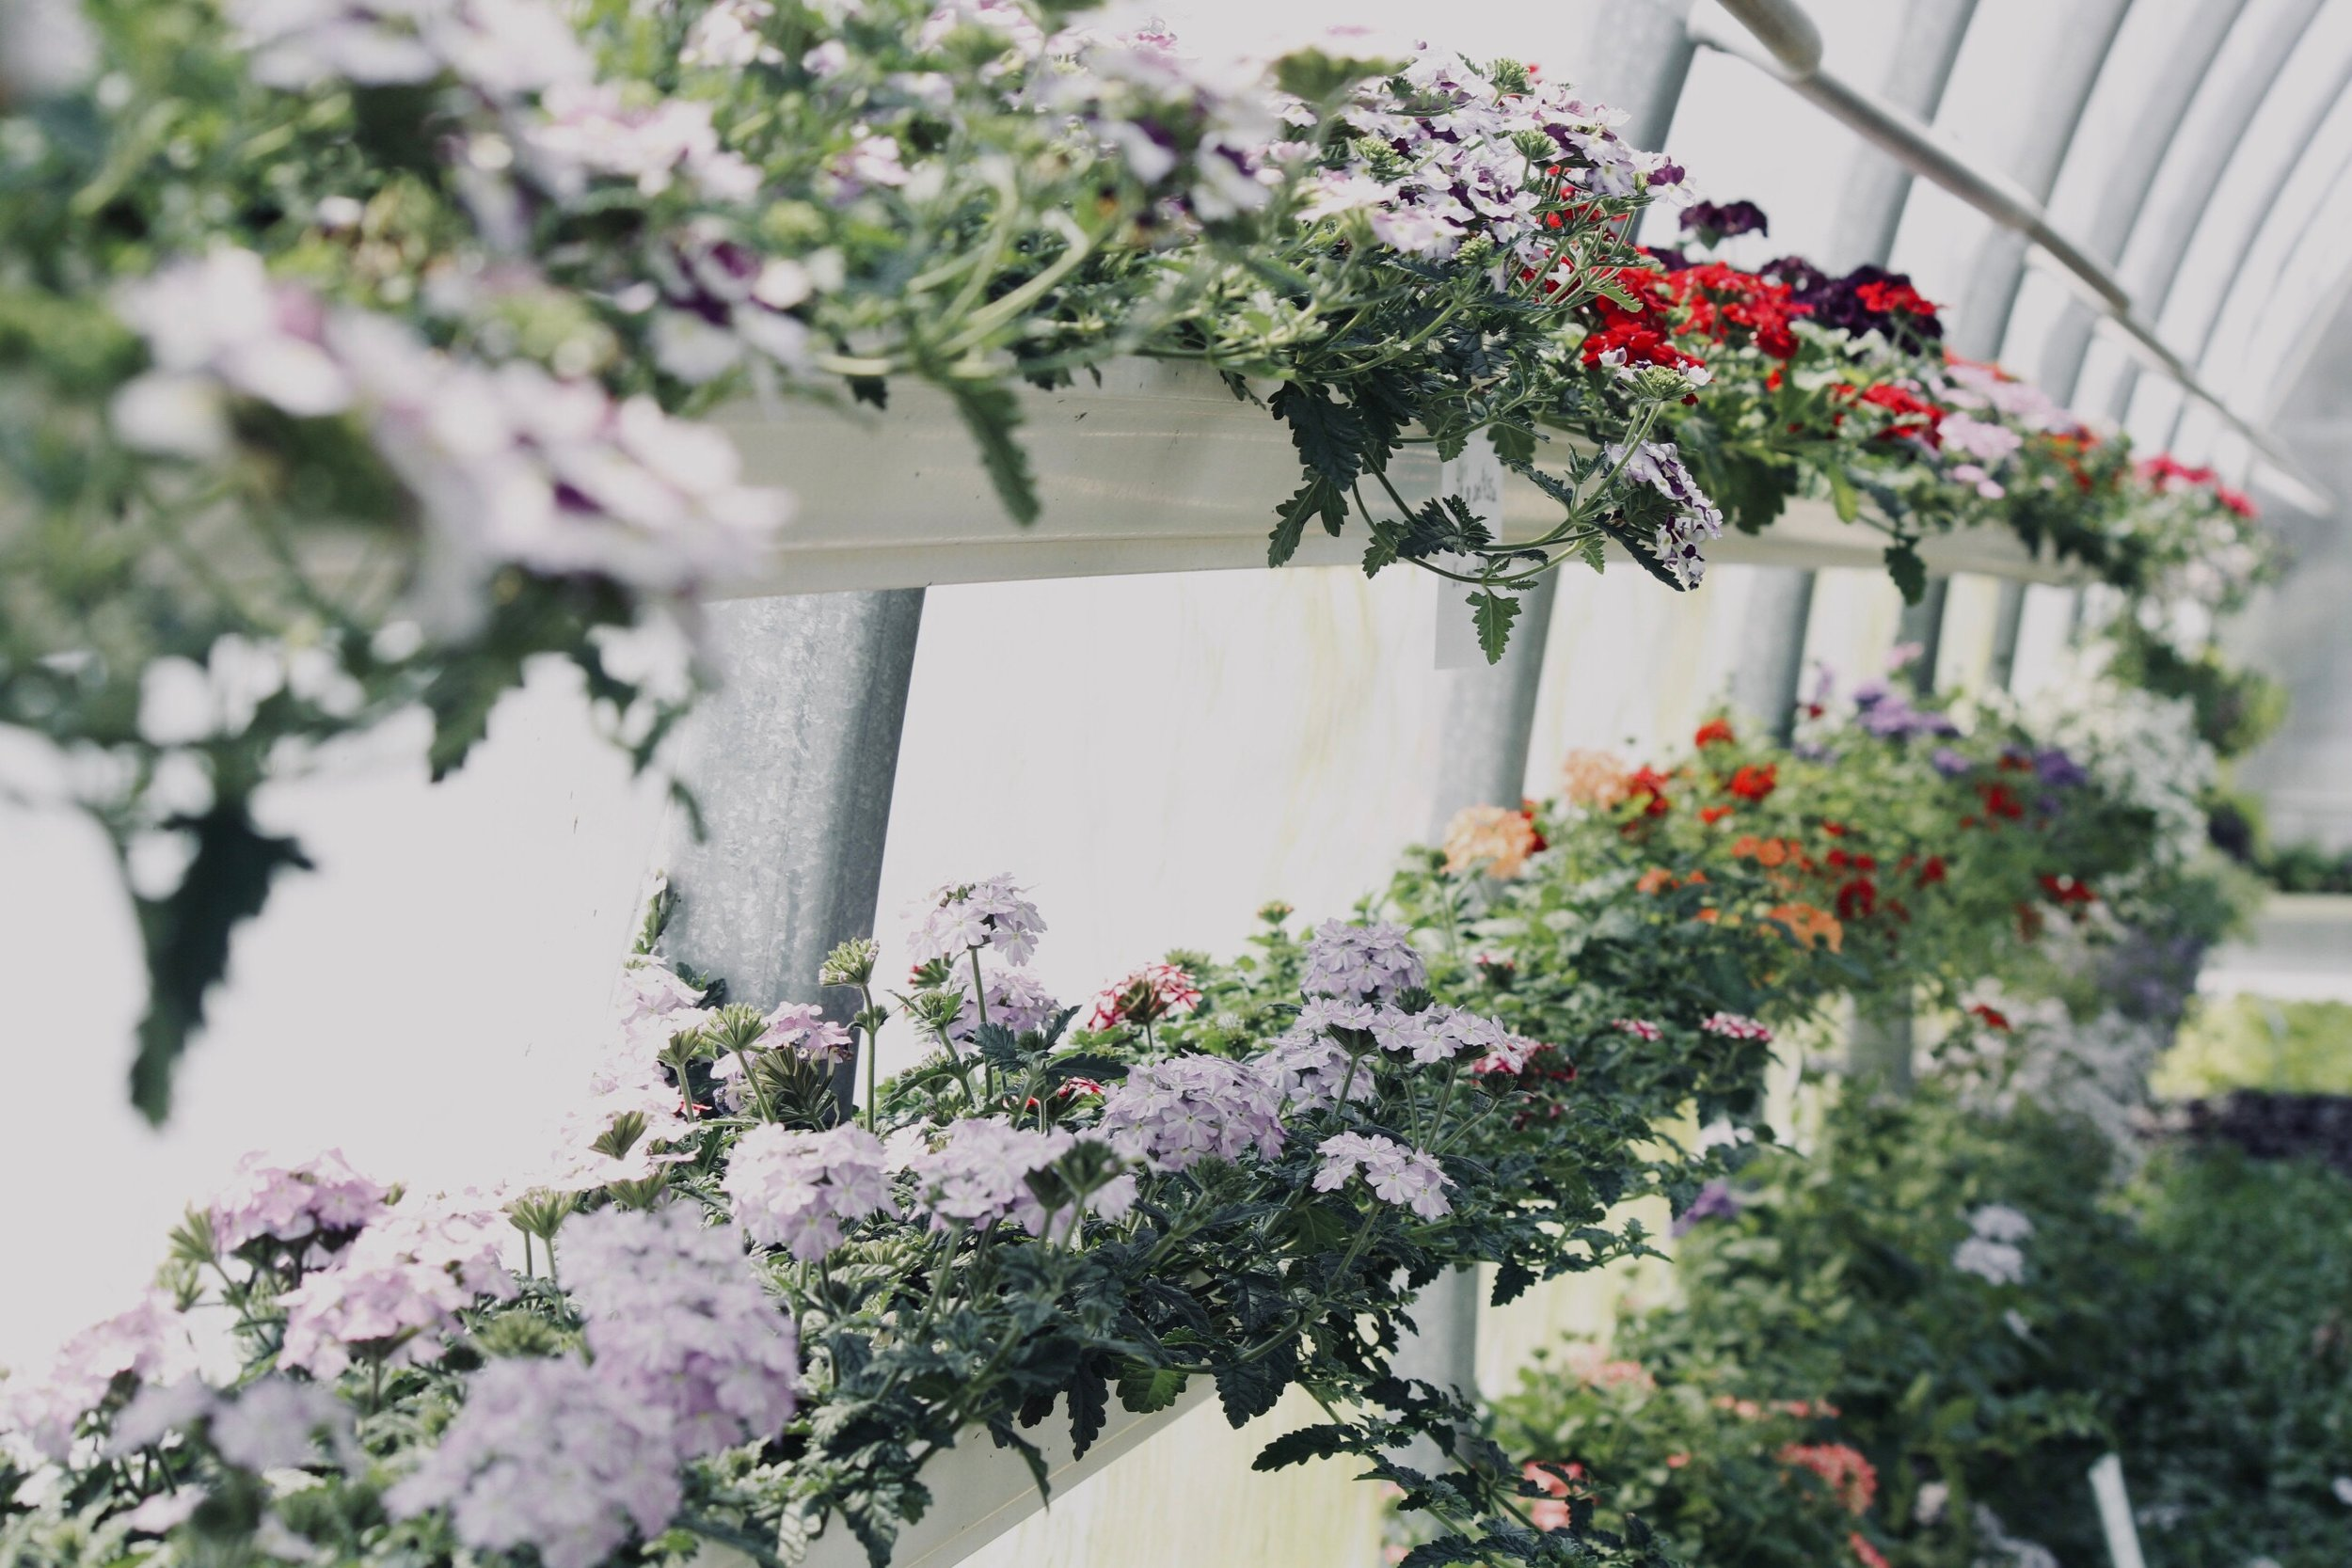 Indoor Garden. Photo by Sydney Rae courtesy of Unsplash.